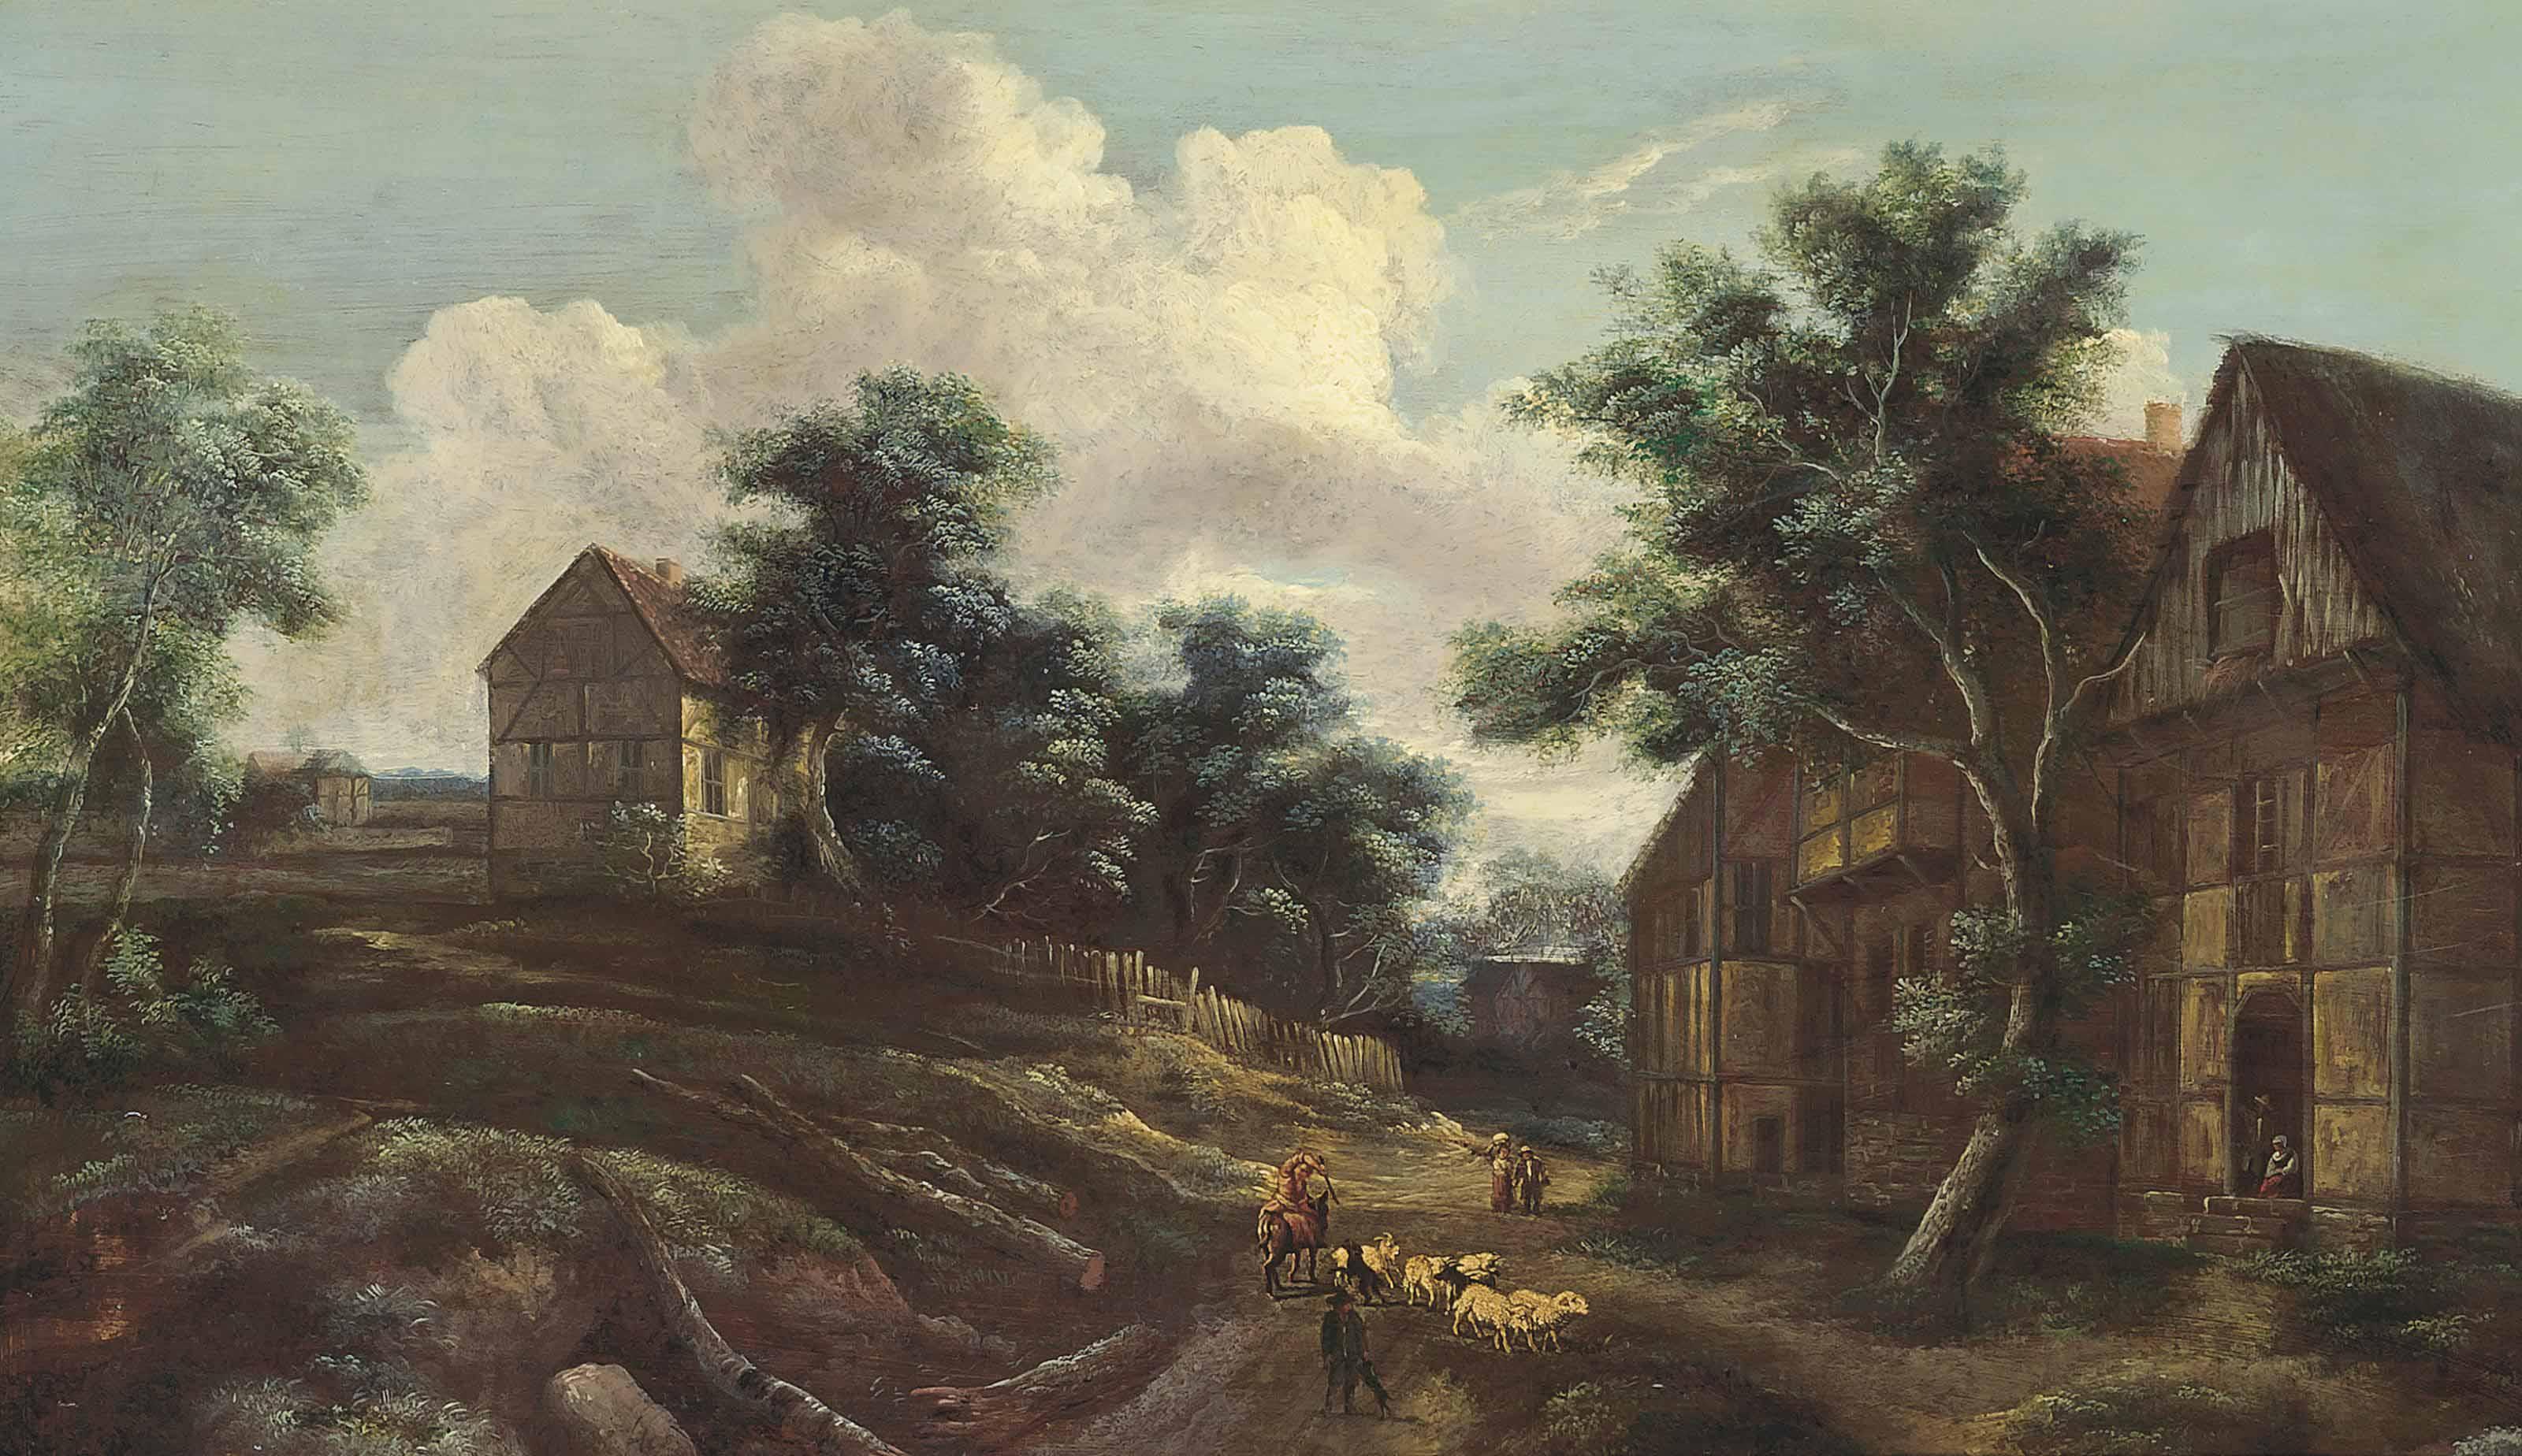 Gerrit van Hees (? 1615/35-167